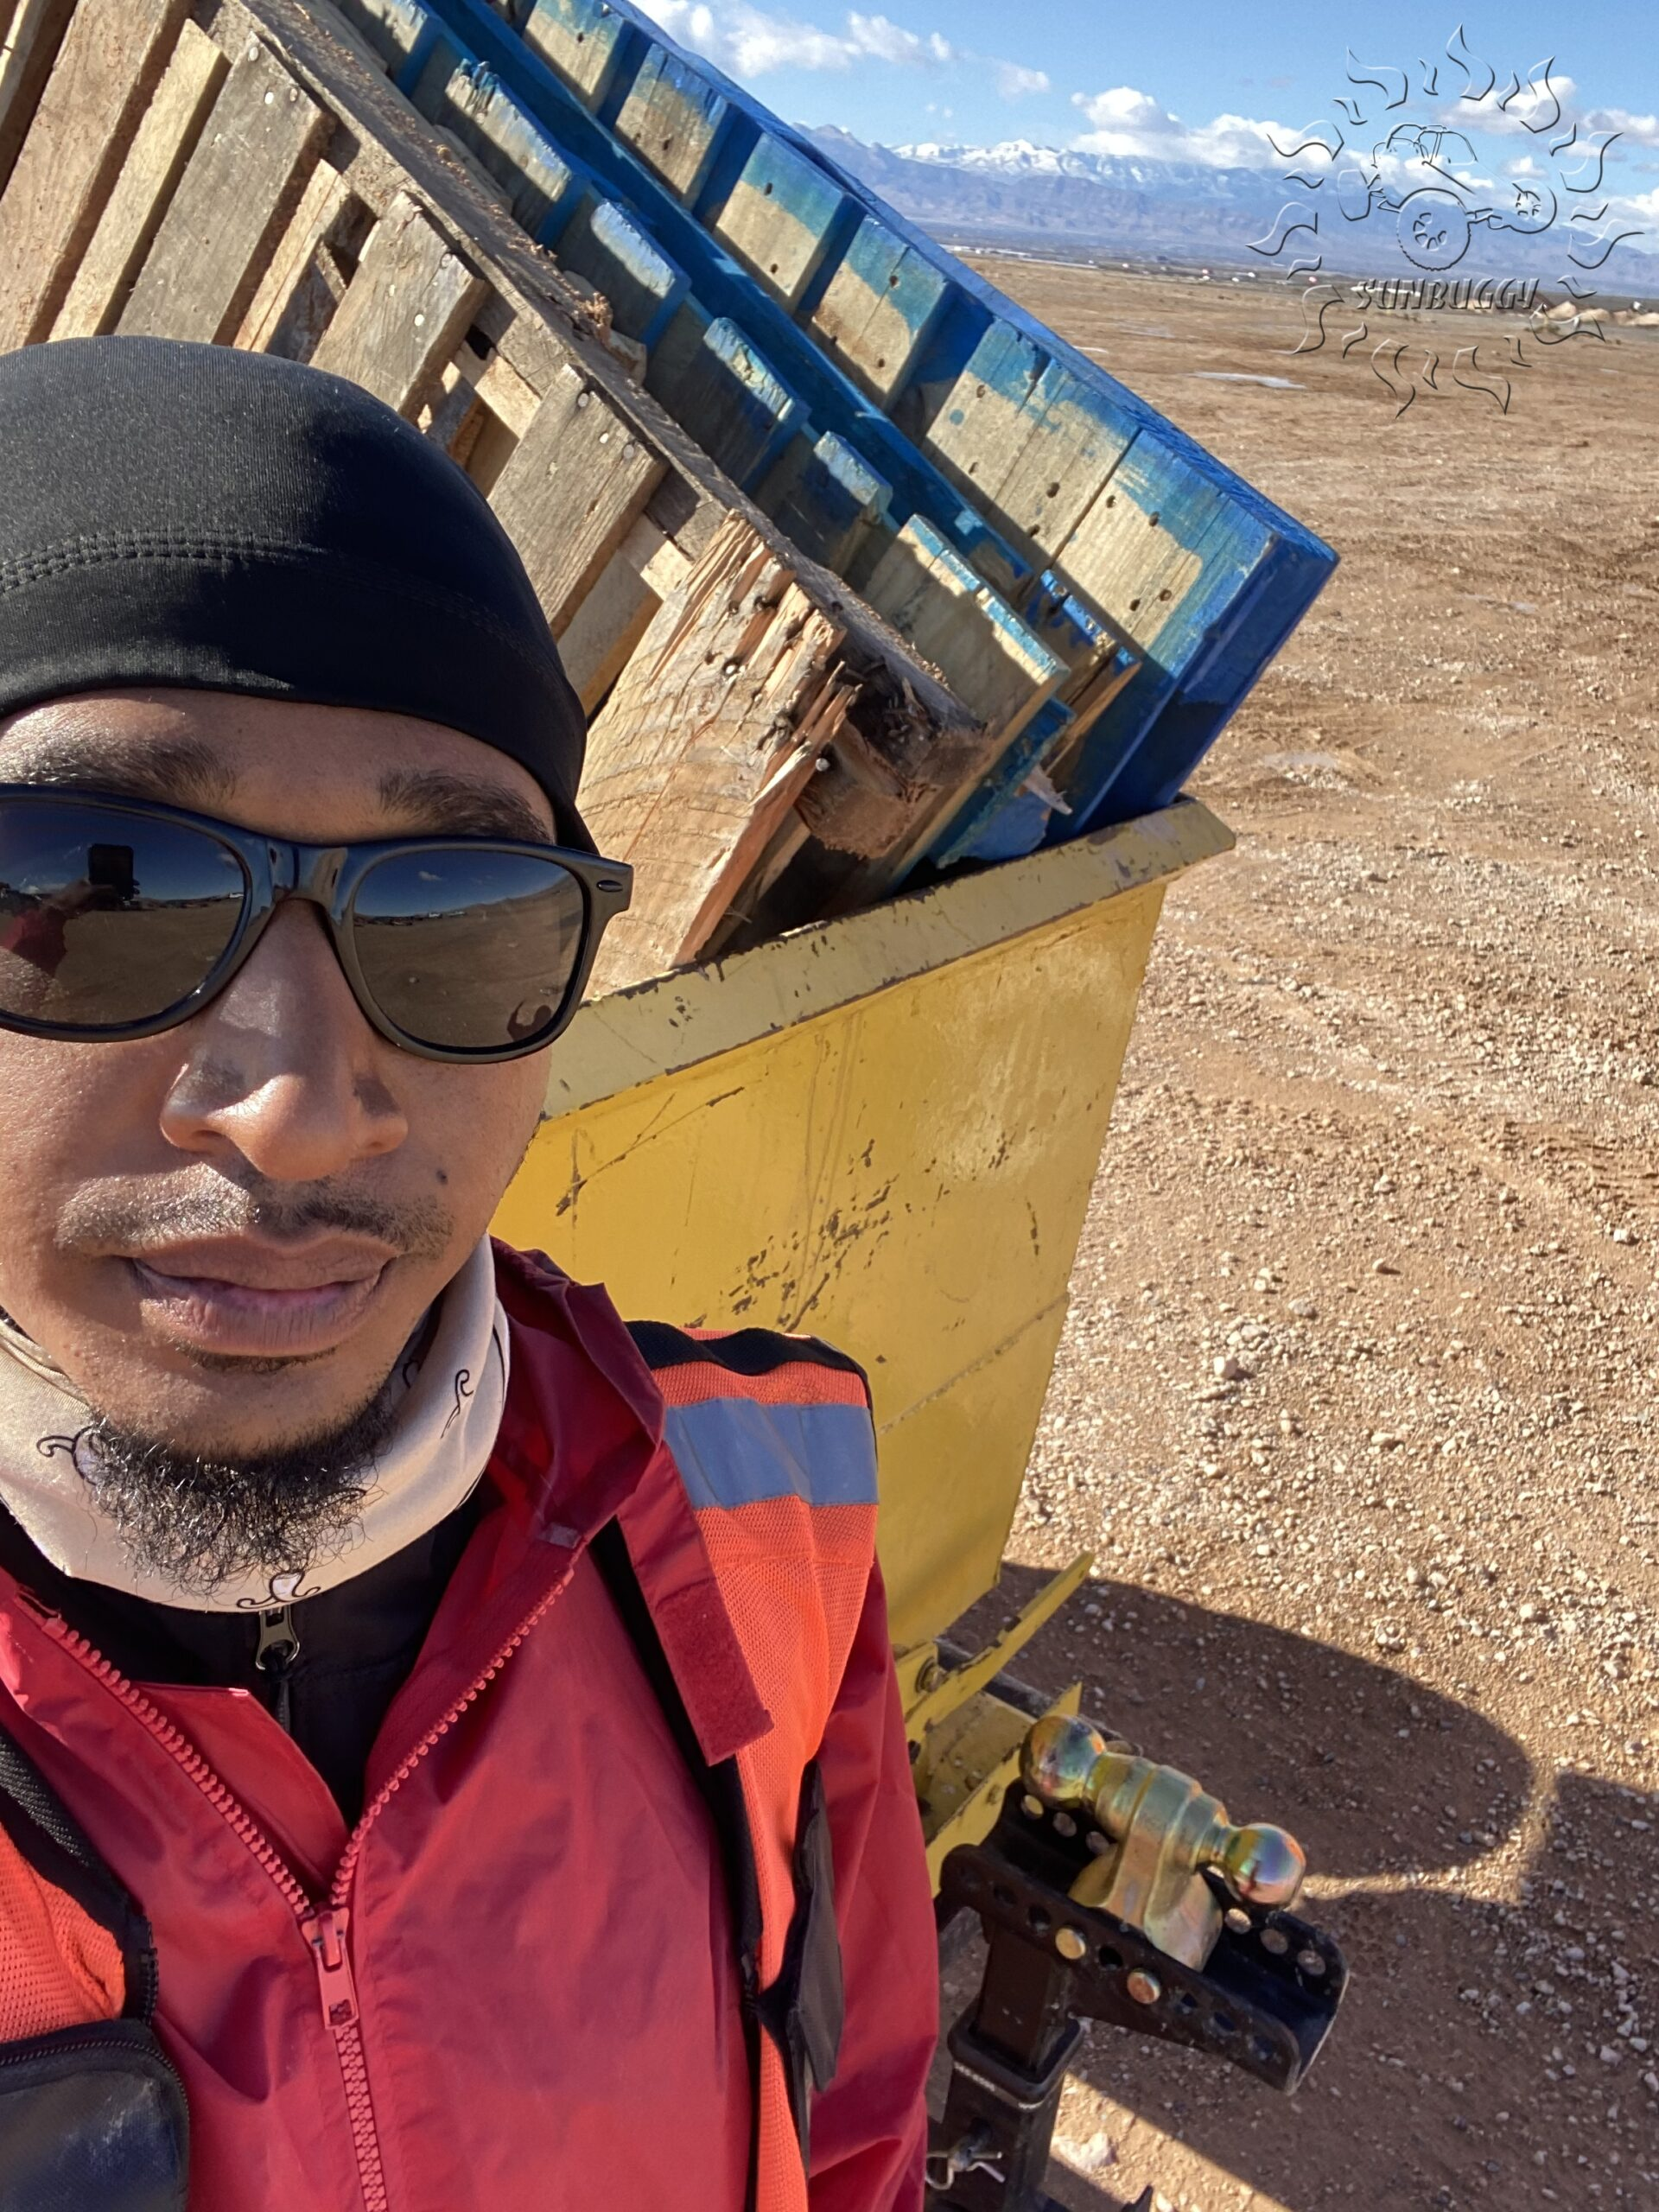 sunbuggy-vegas-Trash_patrol_d_20191215114025_f_sbvegas_p_image0